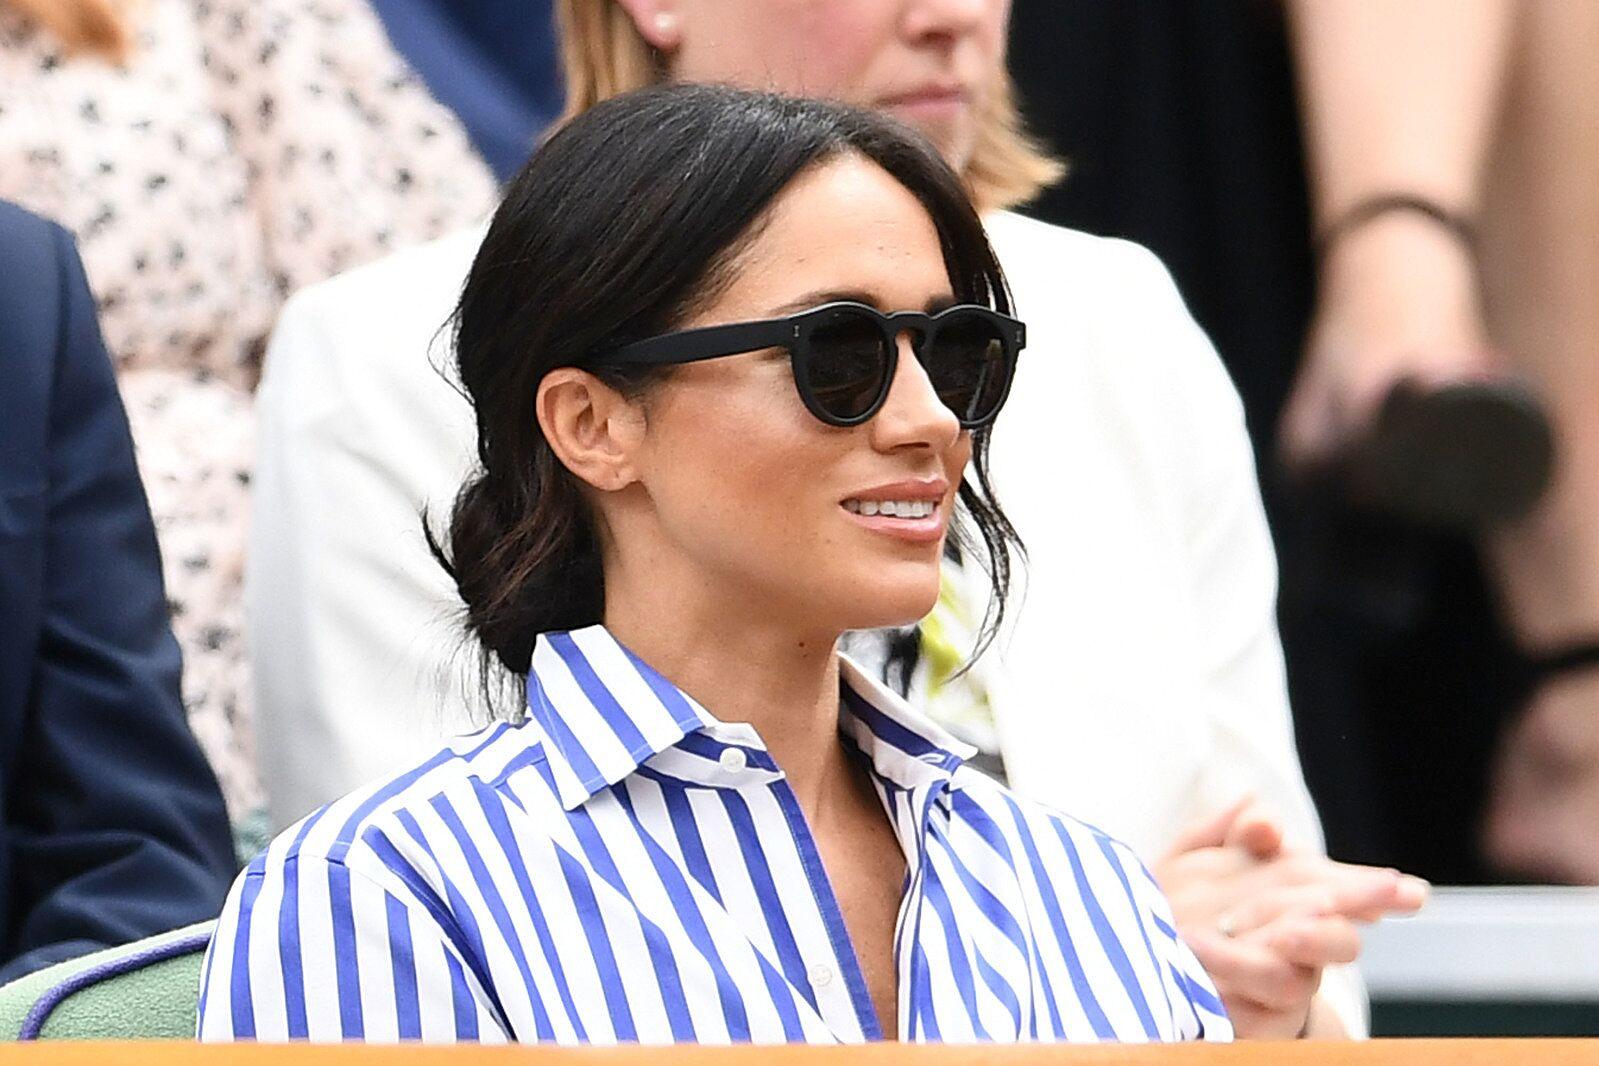 Kim Kardashian's makeup artist gets beauty inspo from Meghan Markle